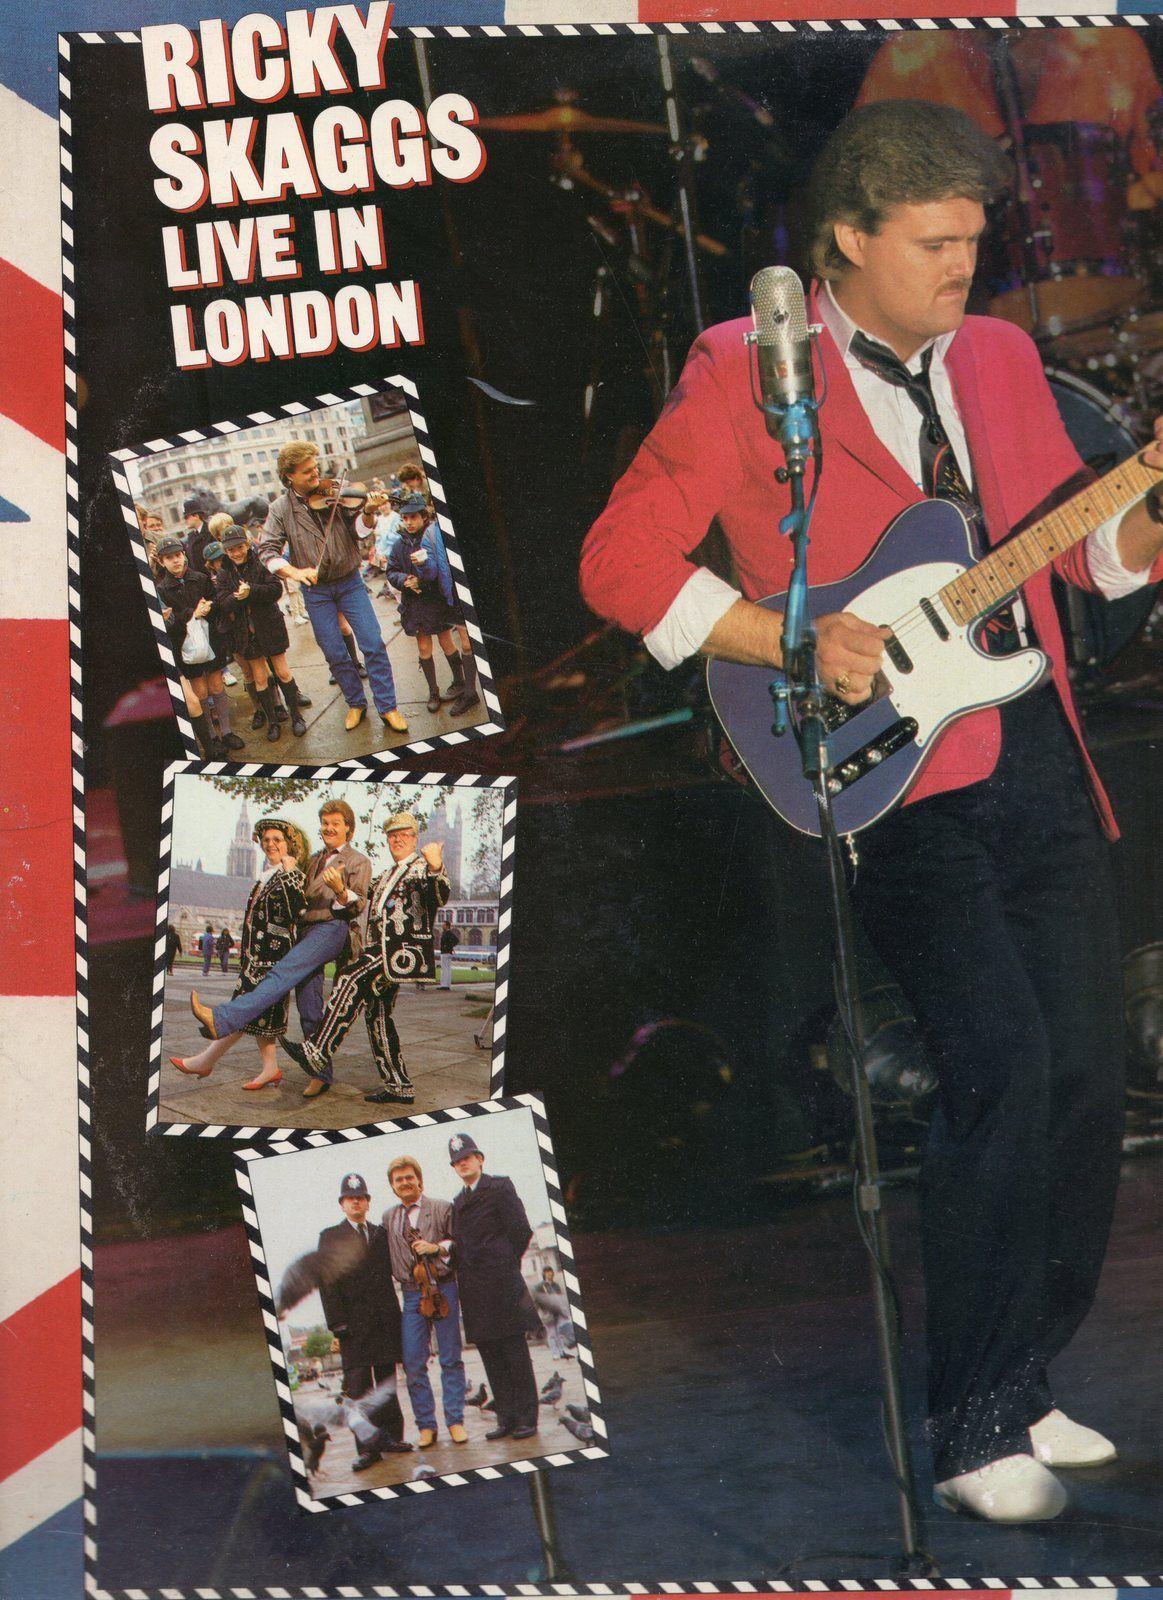 Ricky Skaggs LP Live in London in 2020 London, Vinyl